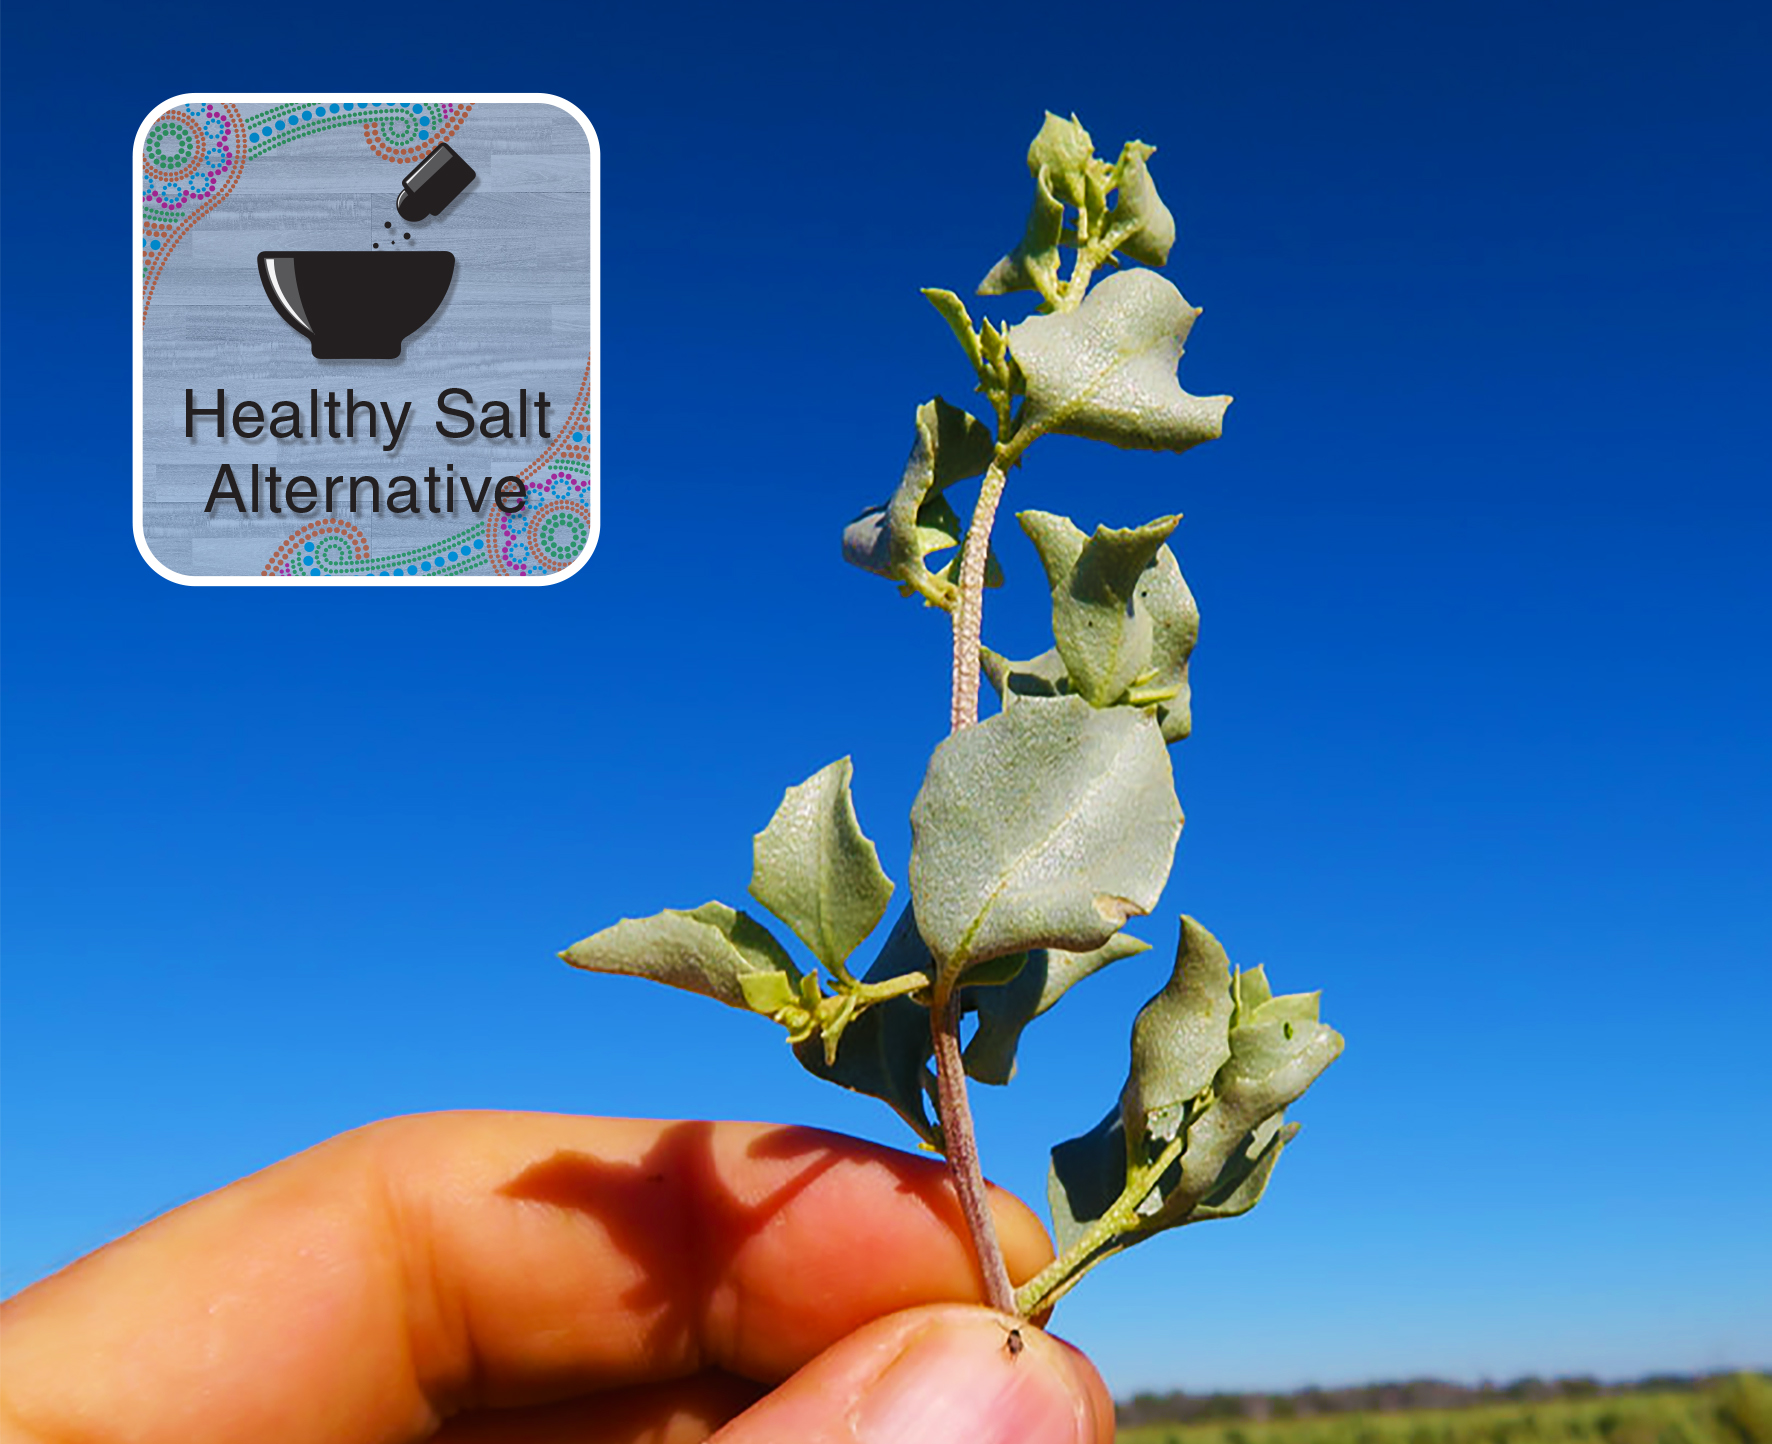 Salt Bush - Healthy Salt Alternative